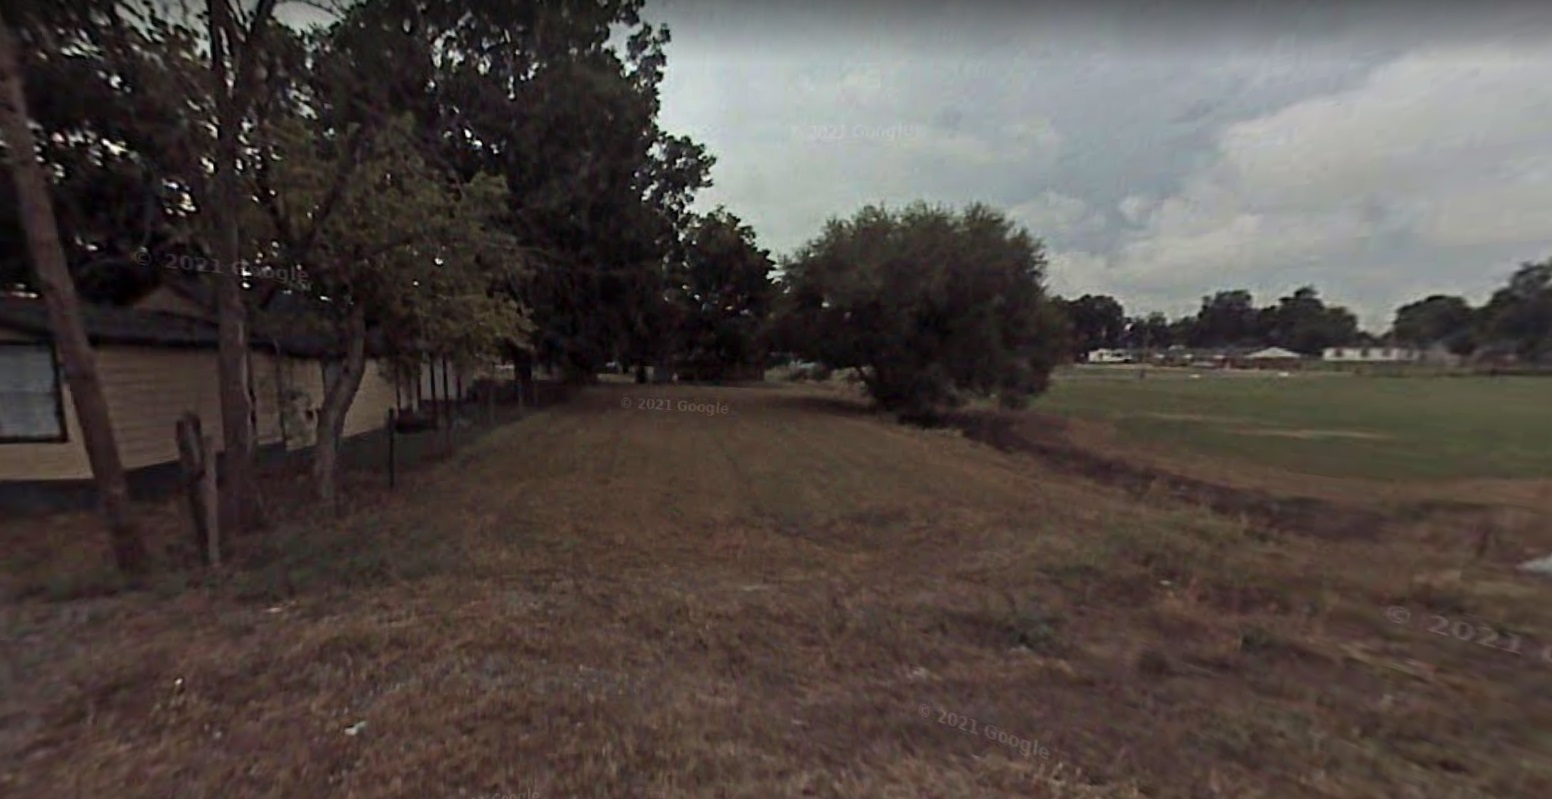 508 Mississippi St, Earle, AR 72331